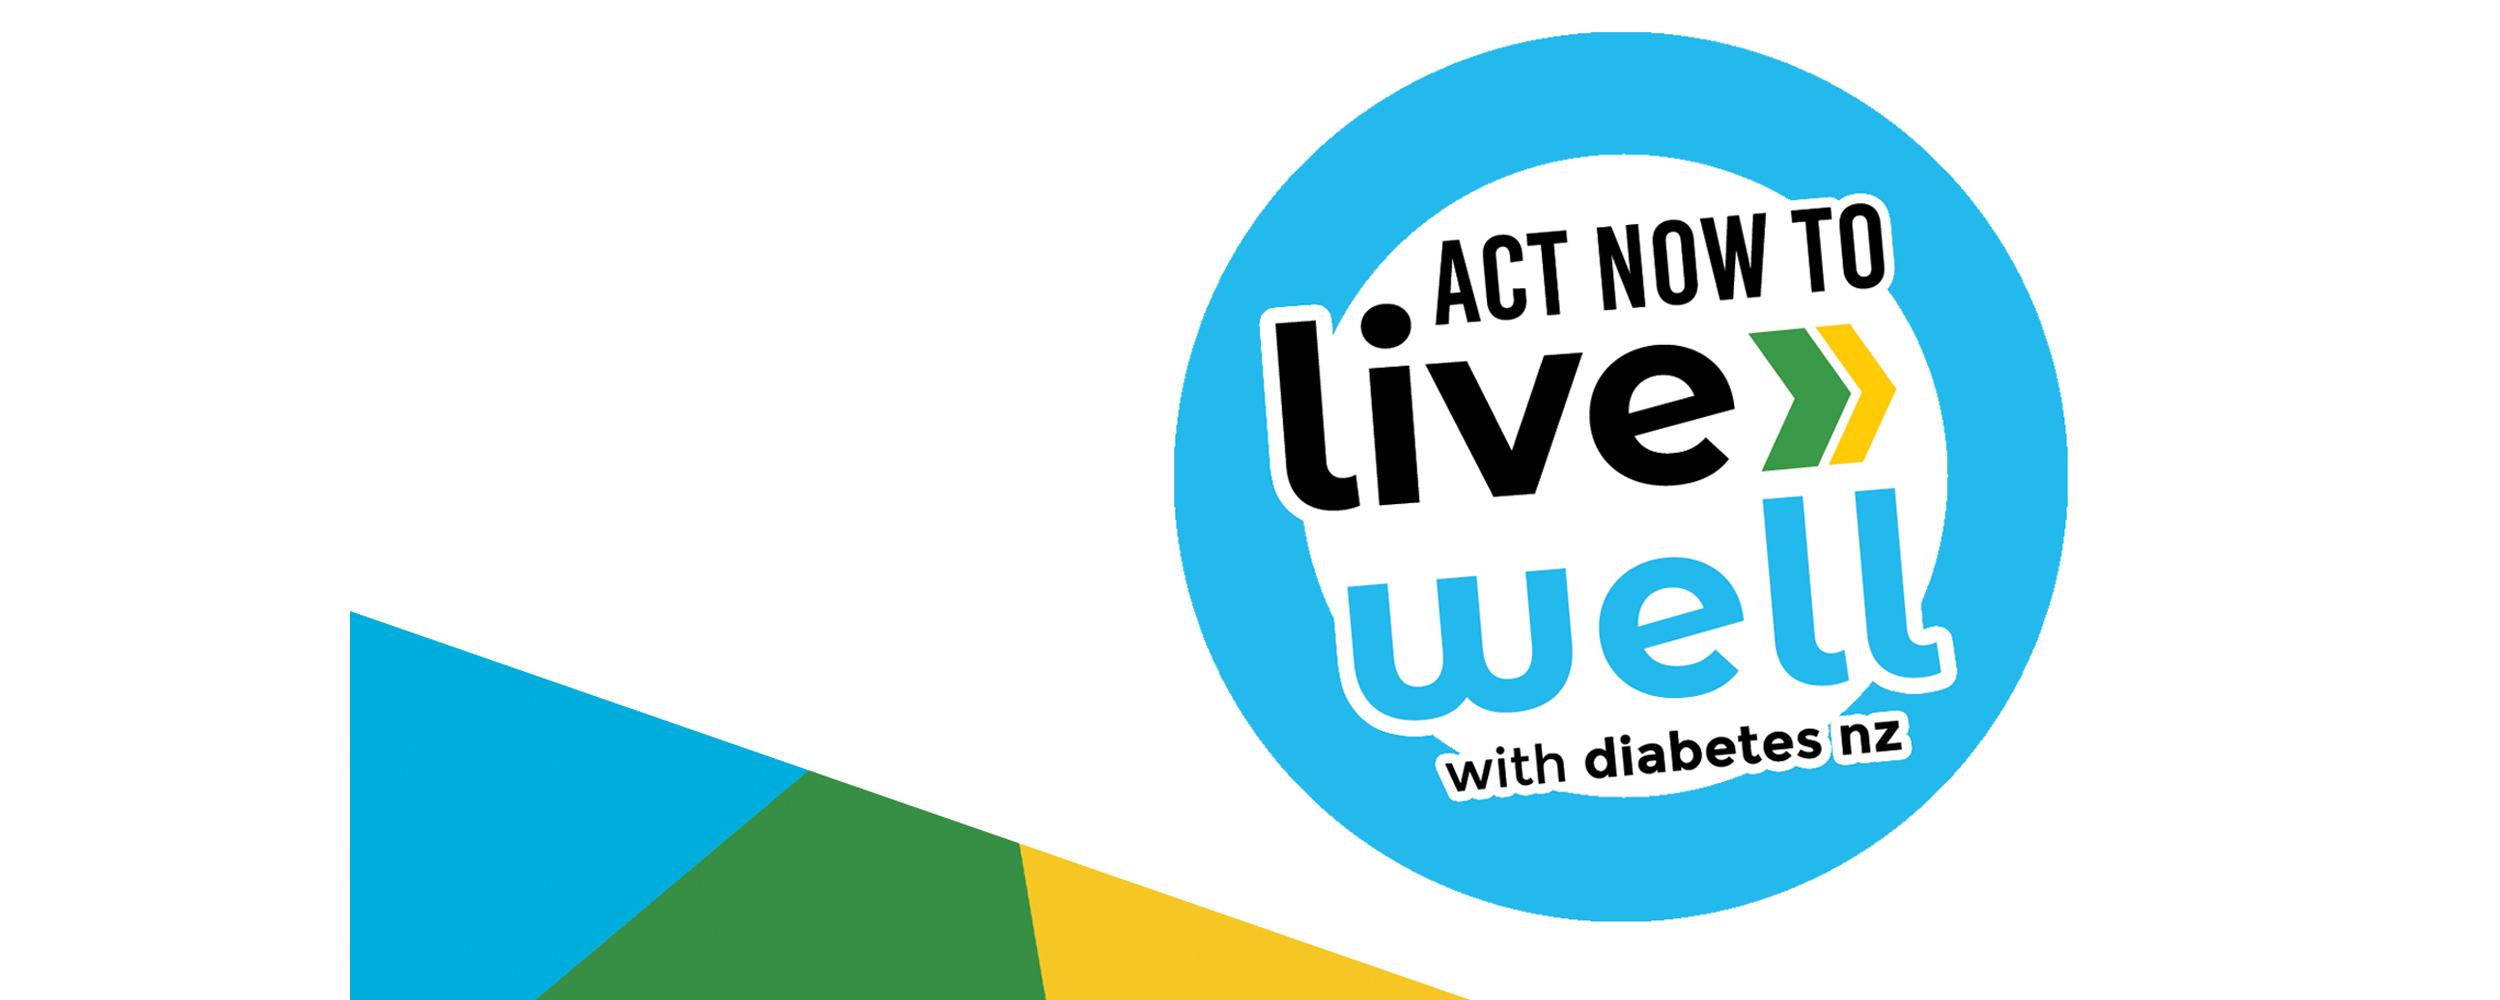 dam-act-now-banner.jpg